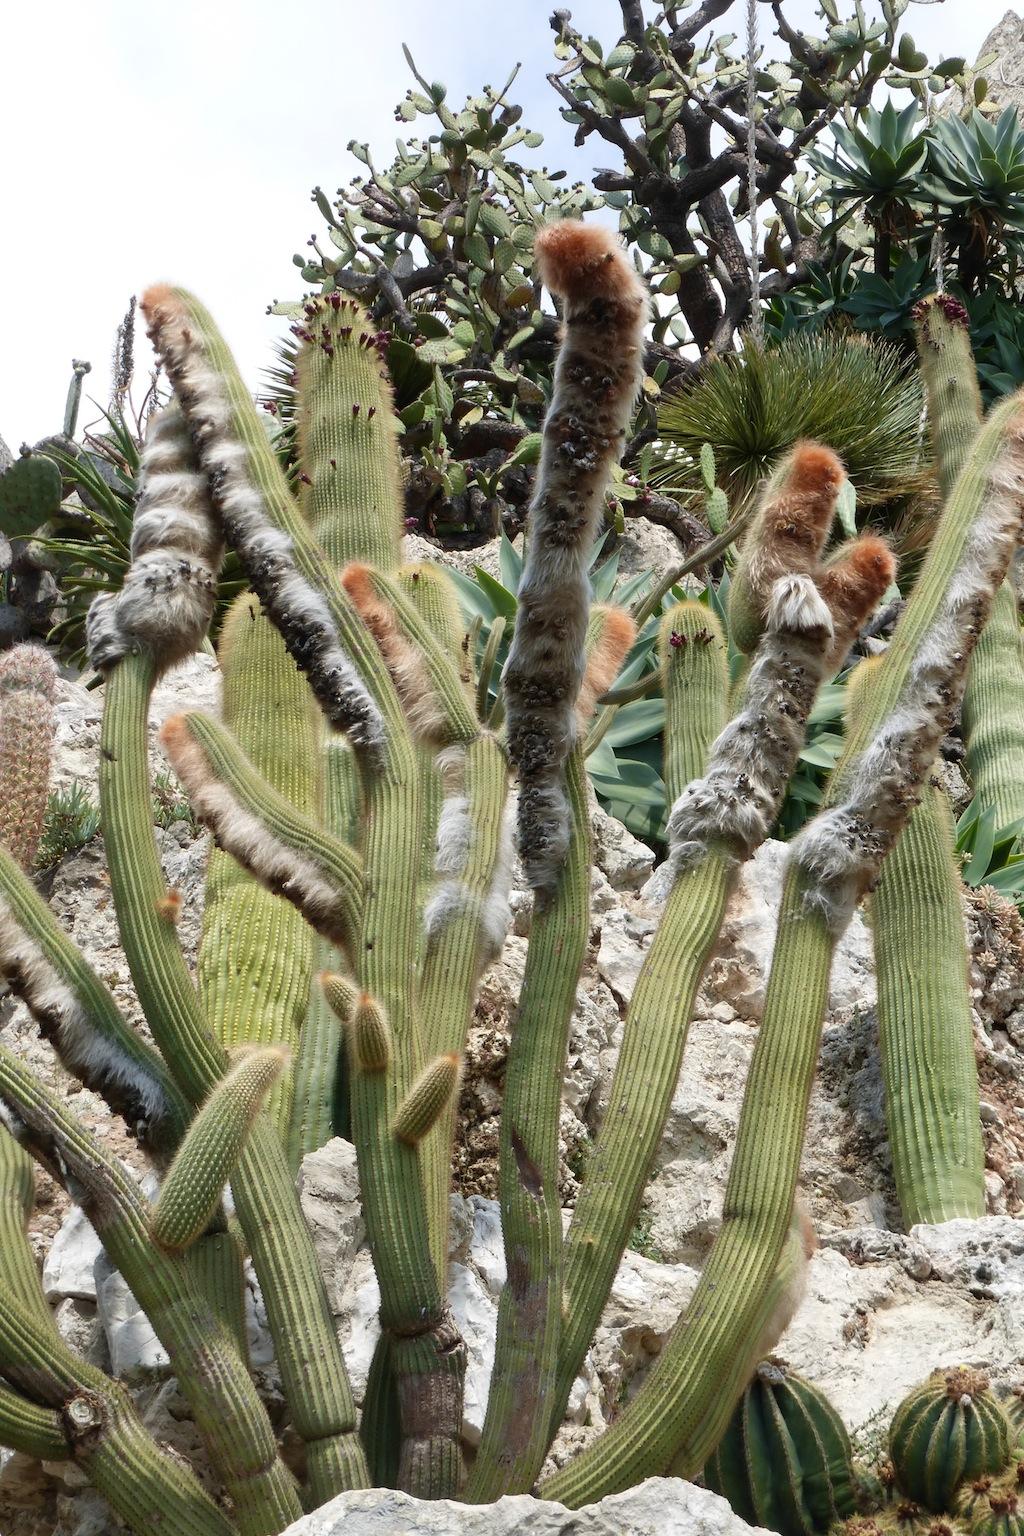 Giardino Esotico di Montecarlo